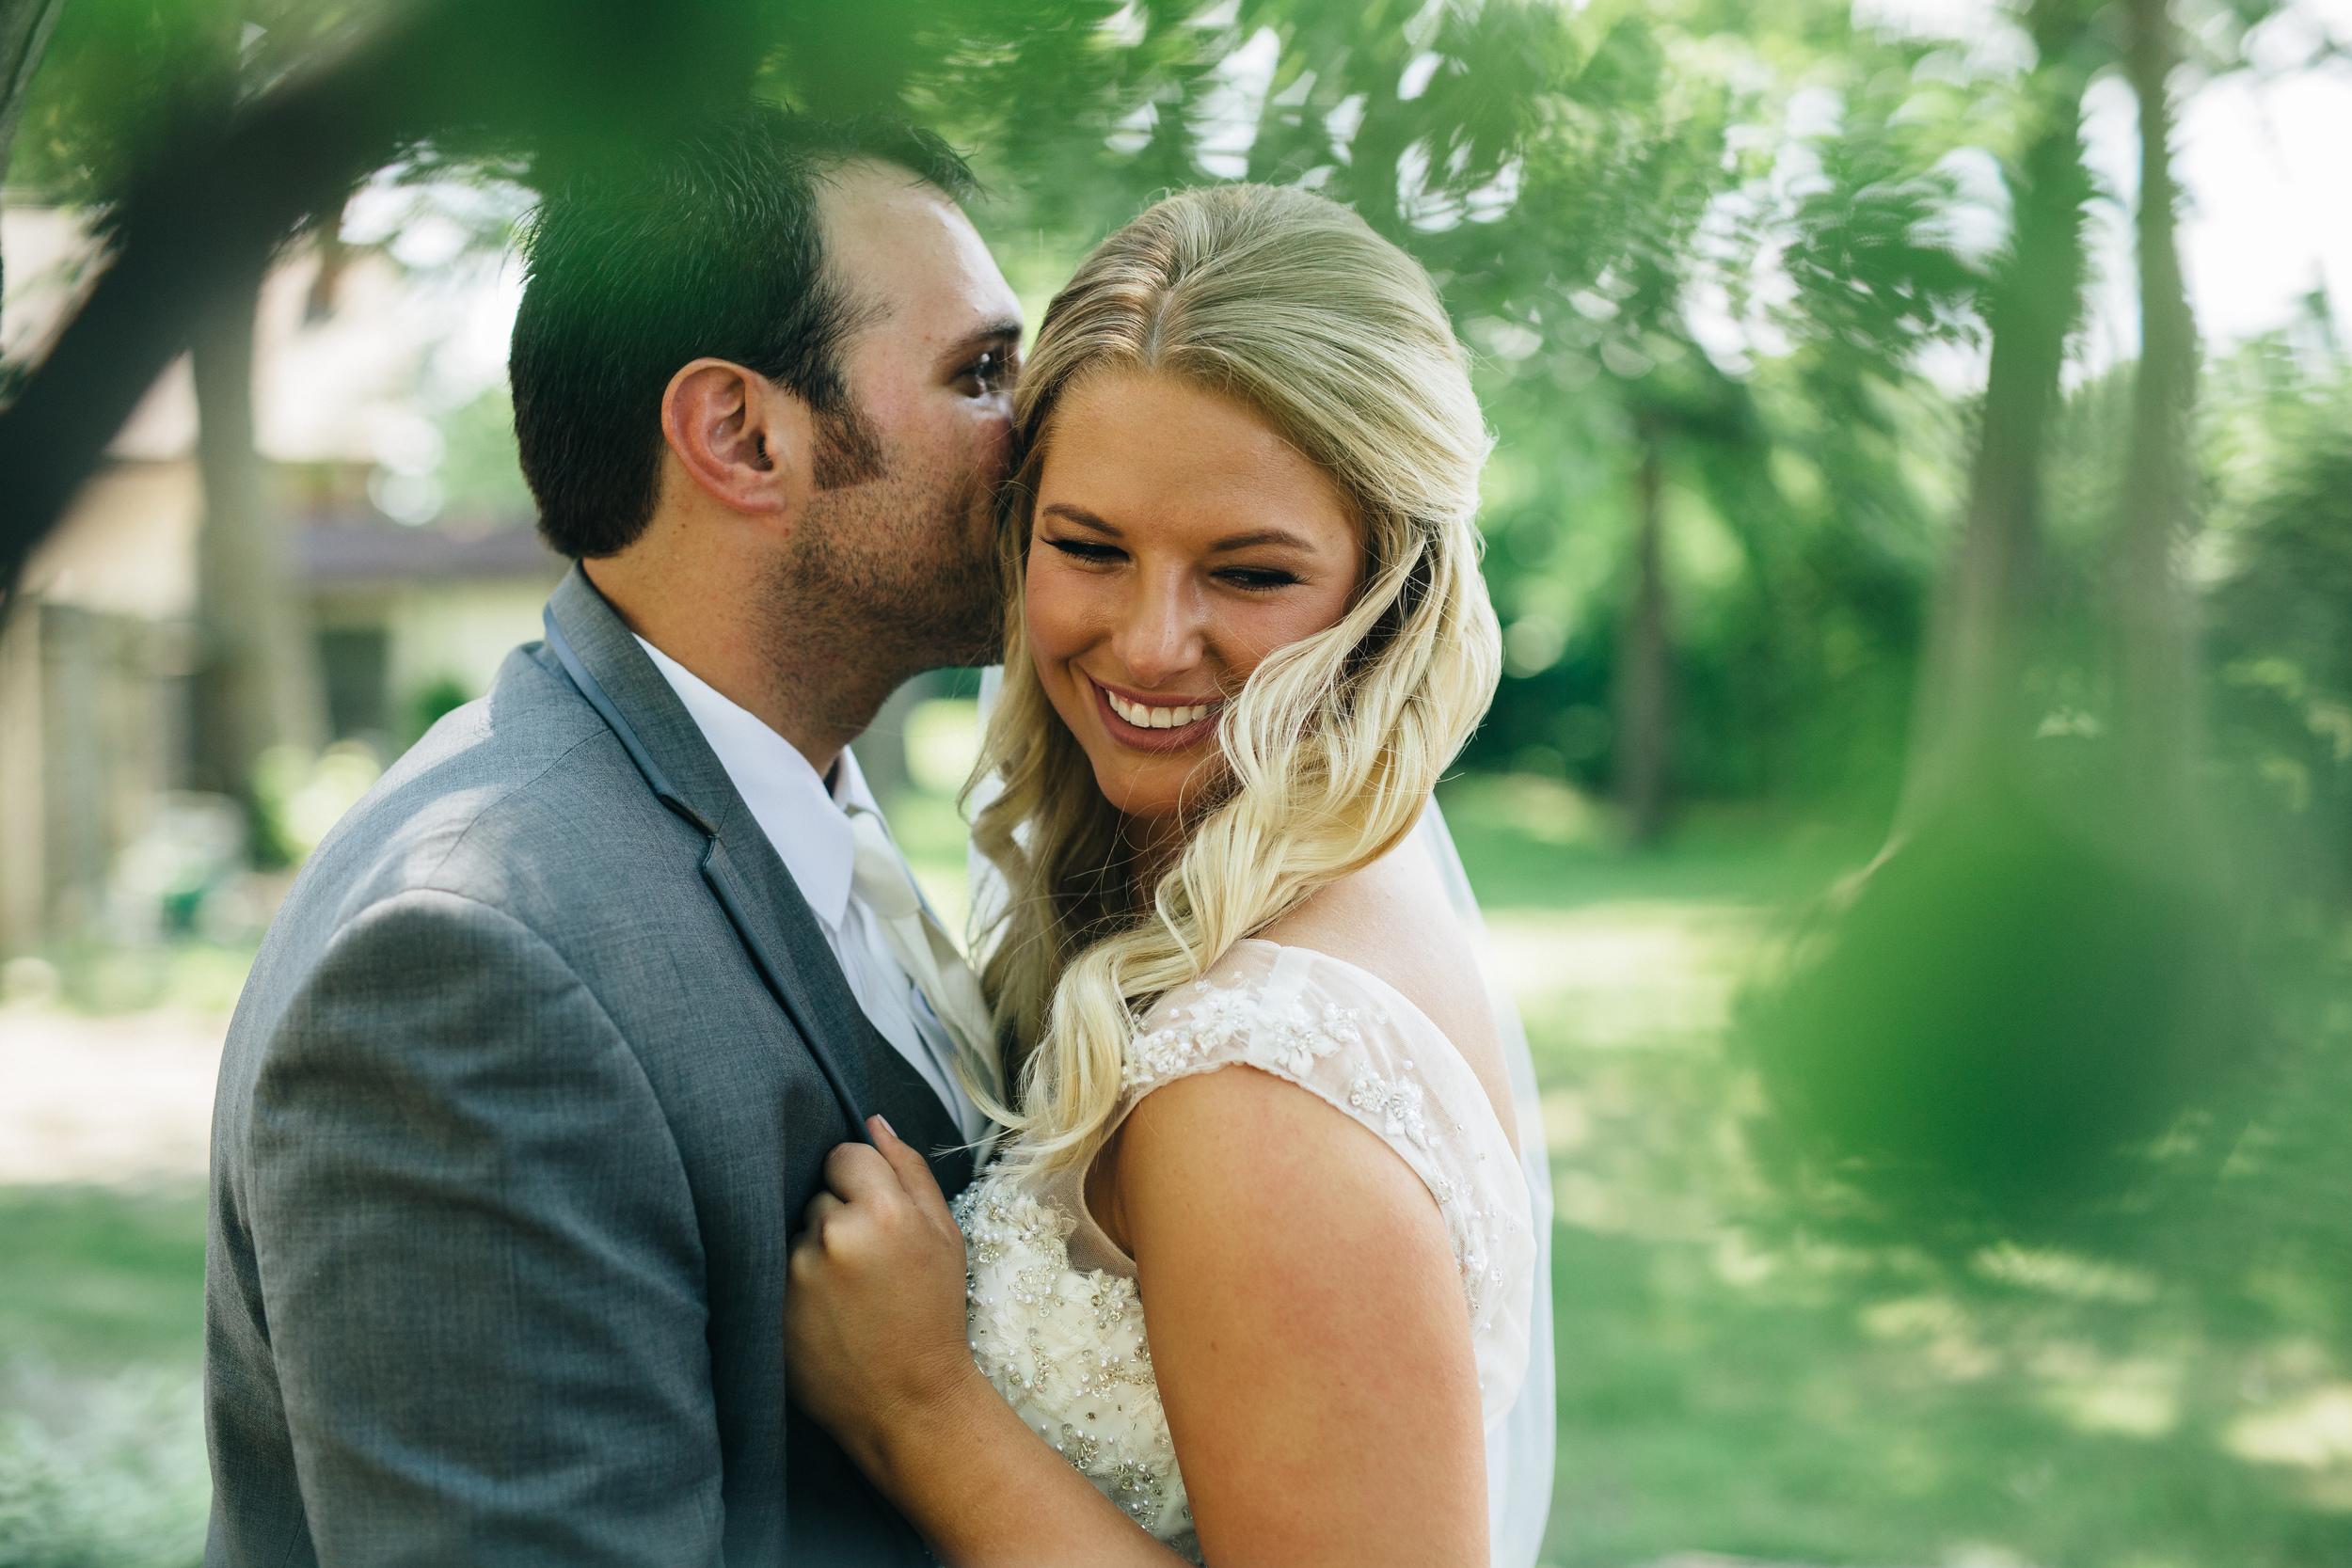 Summer wedding in Oregon, Ohio at Oak Shade Grove.